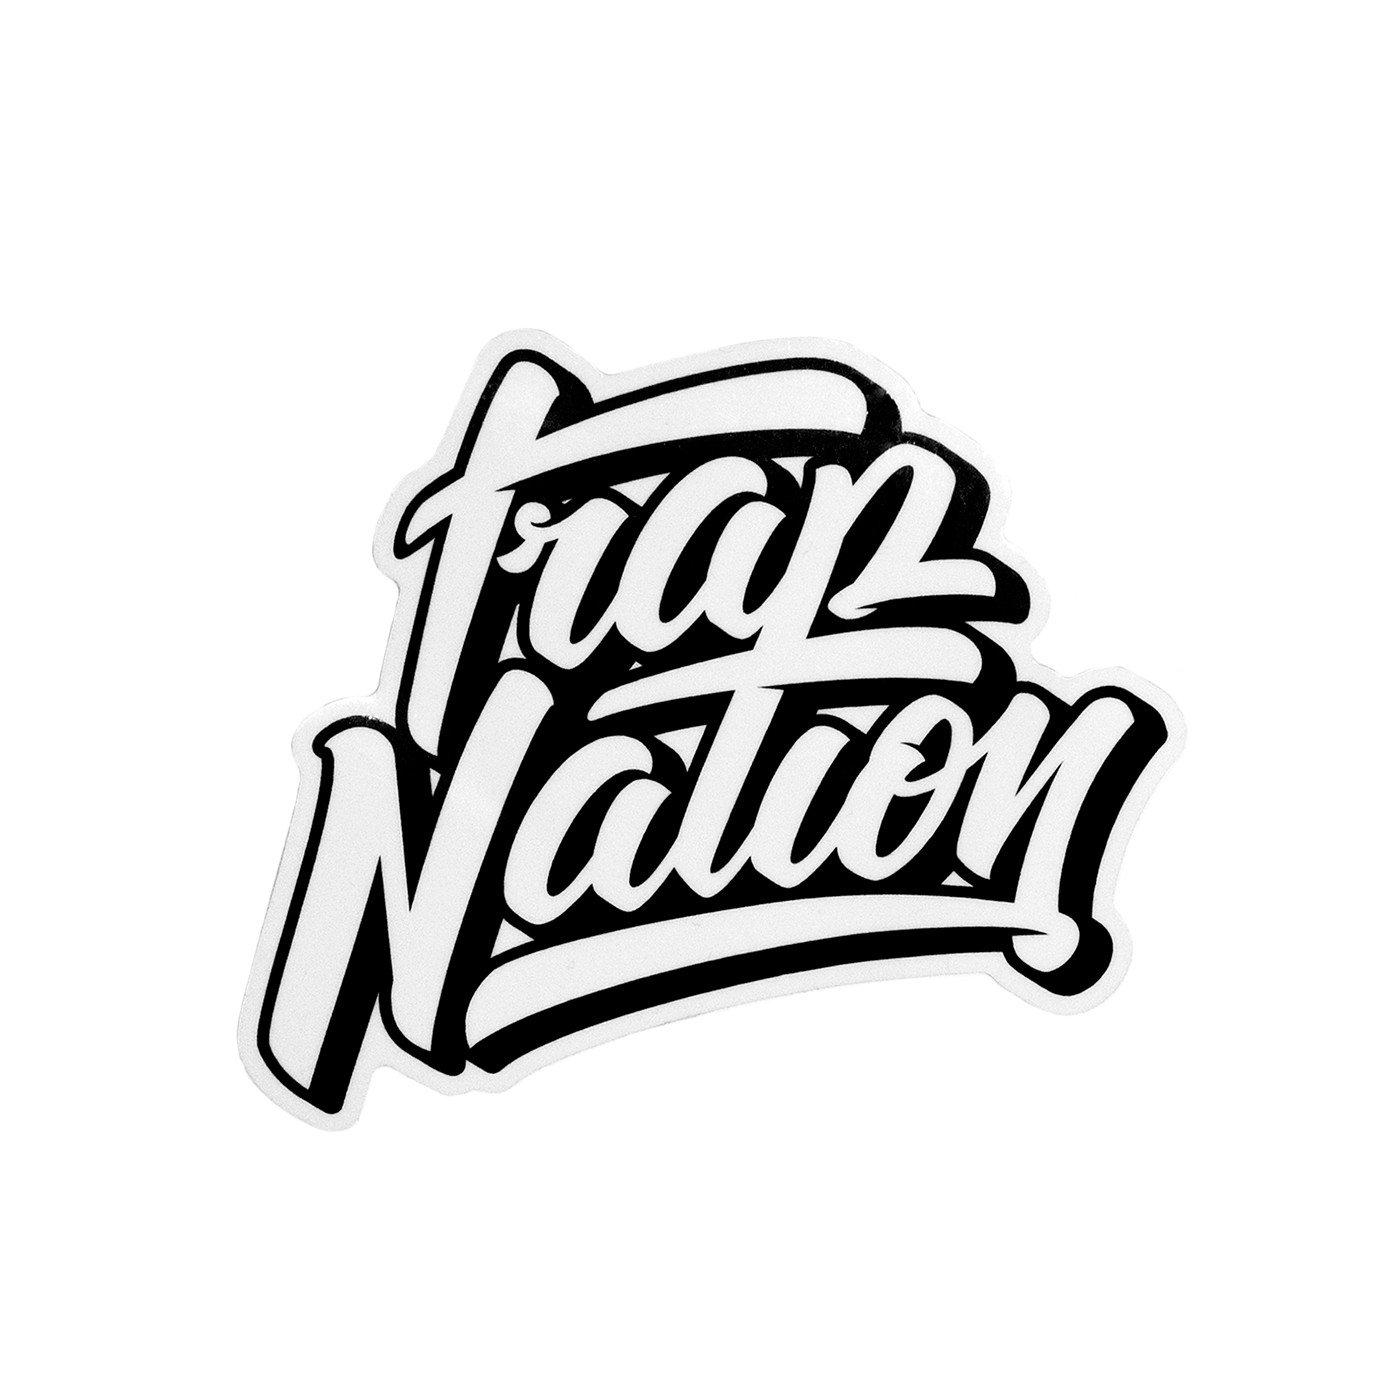 Trap Nation Logos